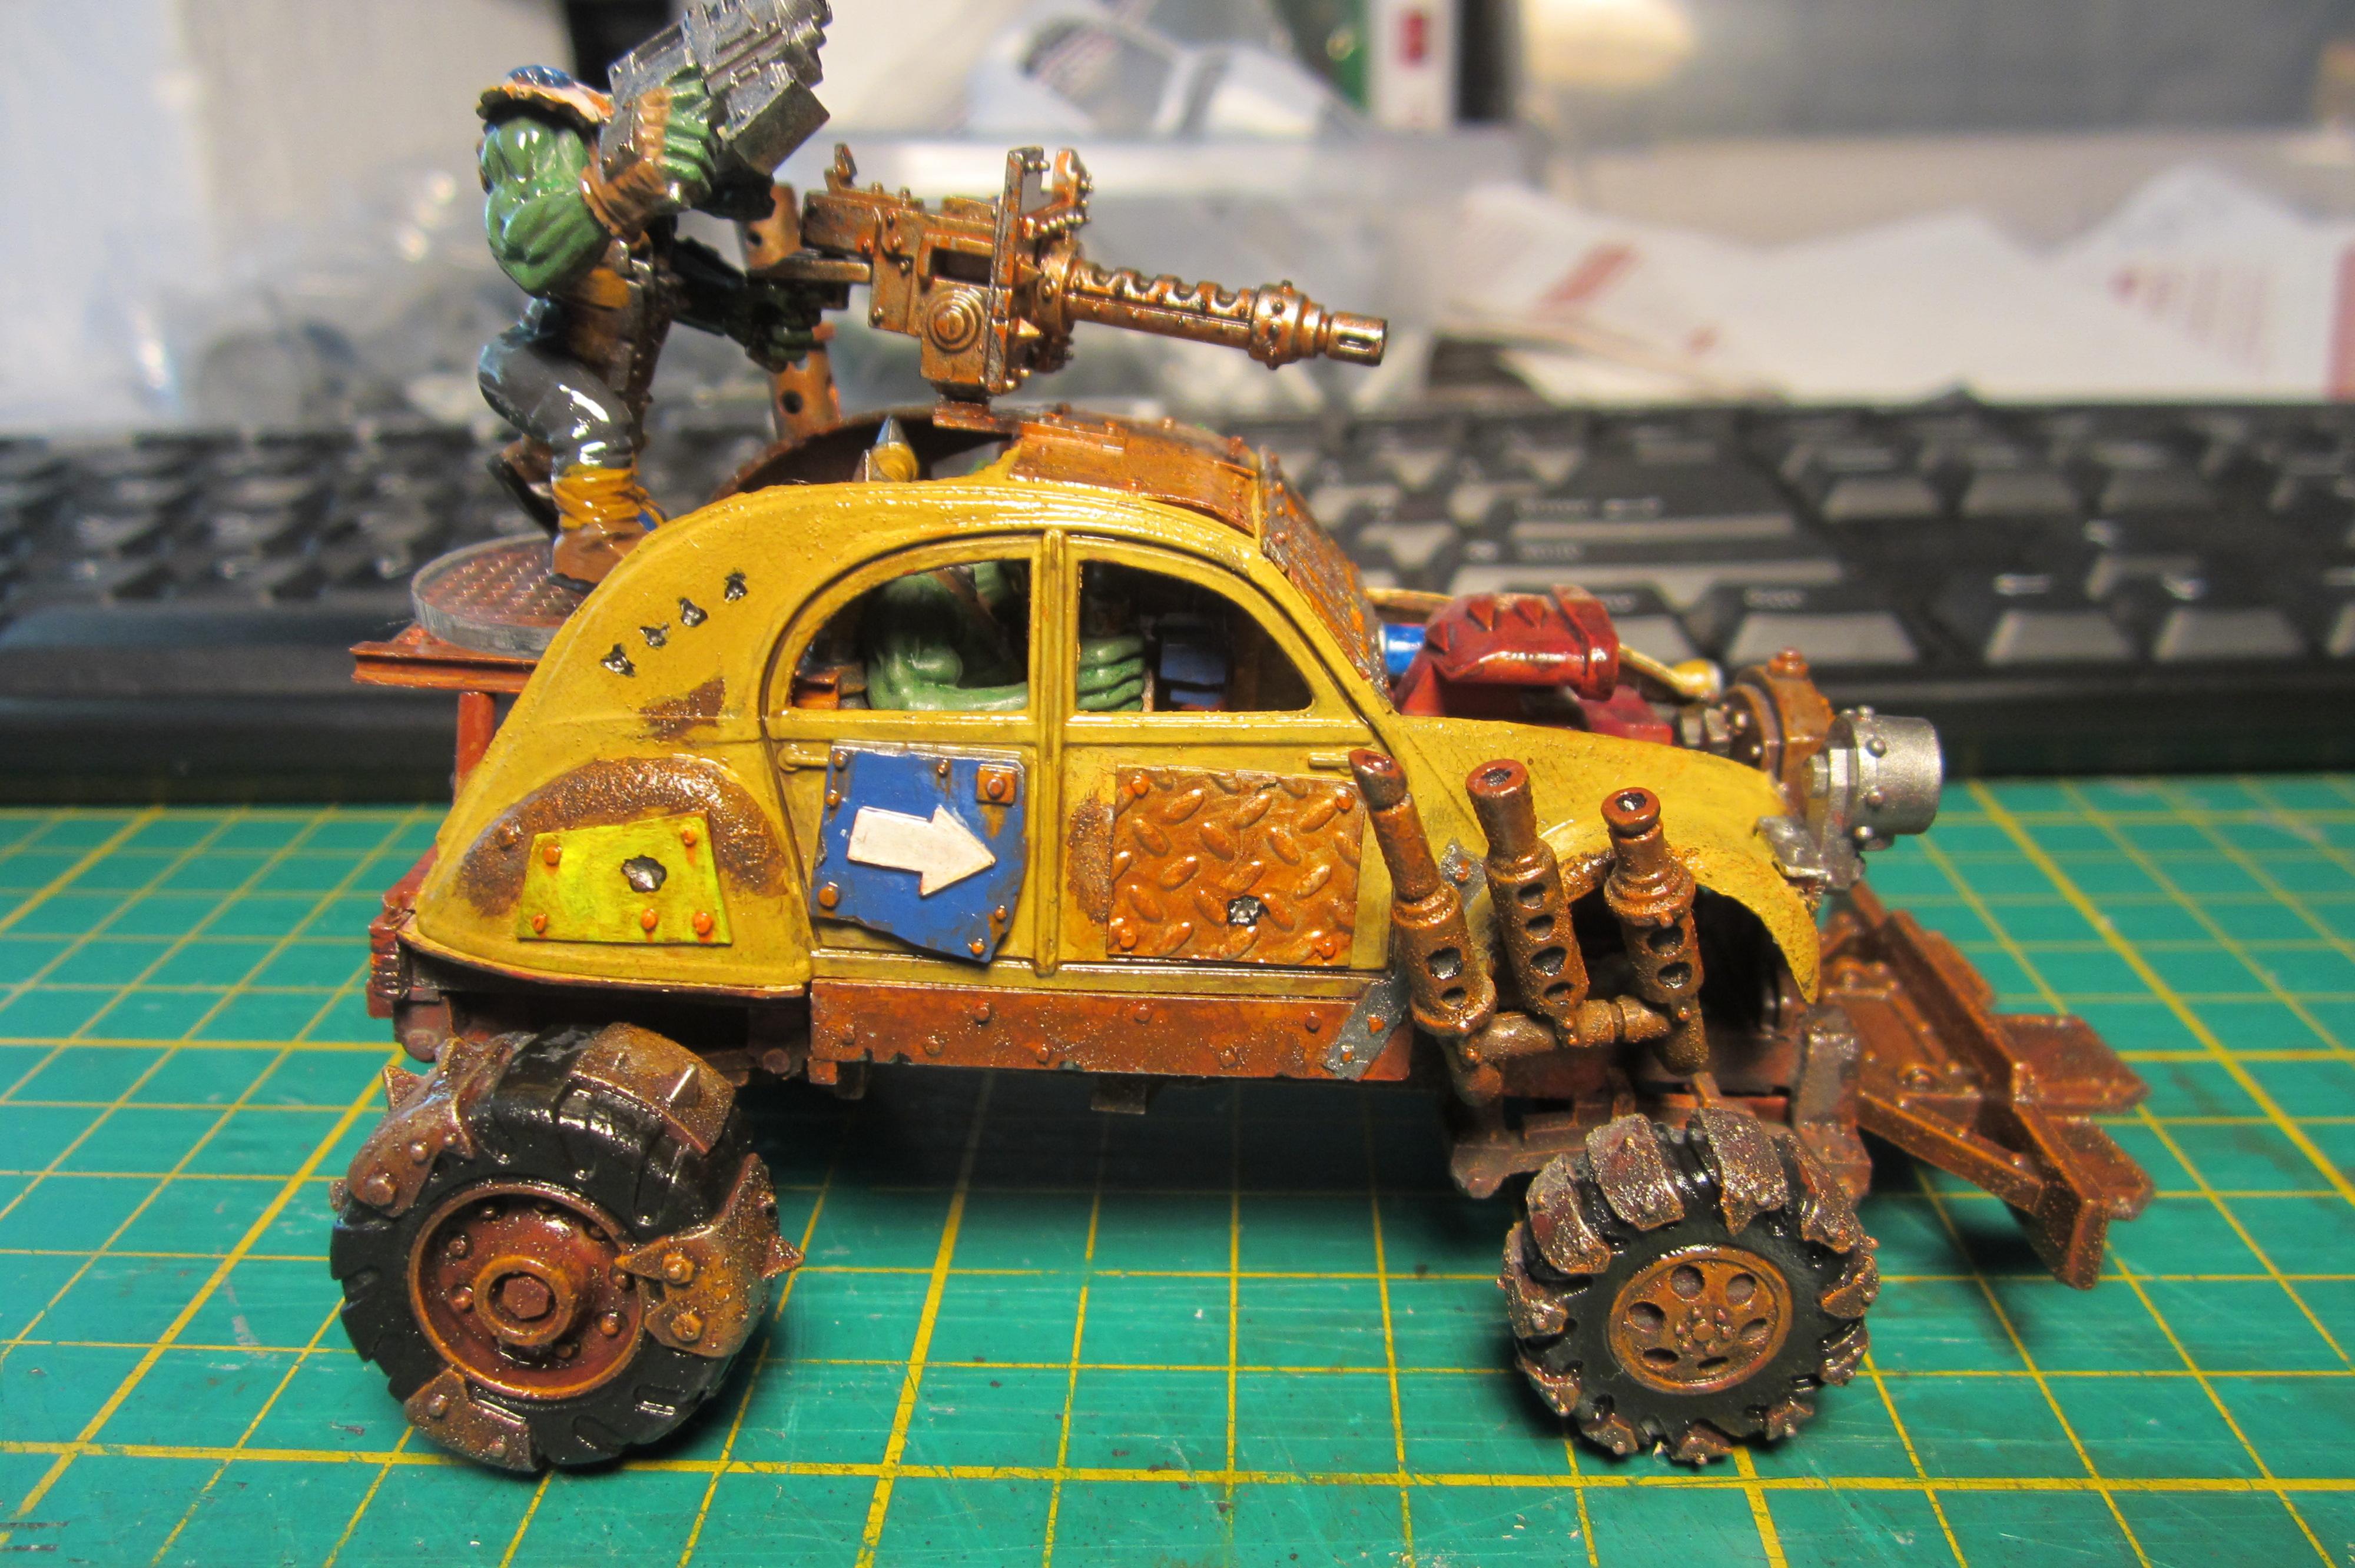 Army Painter, Conversion, Gorkamorka, Ork Buggies, Ork Buggy, Orks, Quickshade, Warhammer 40,000